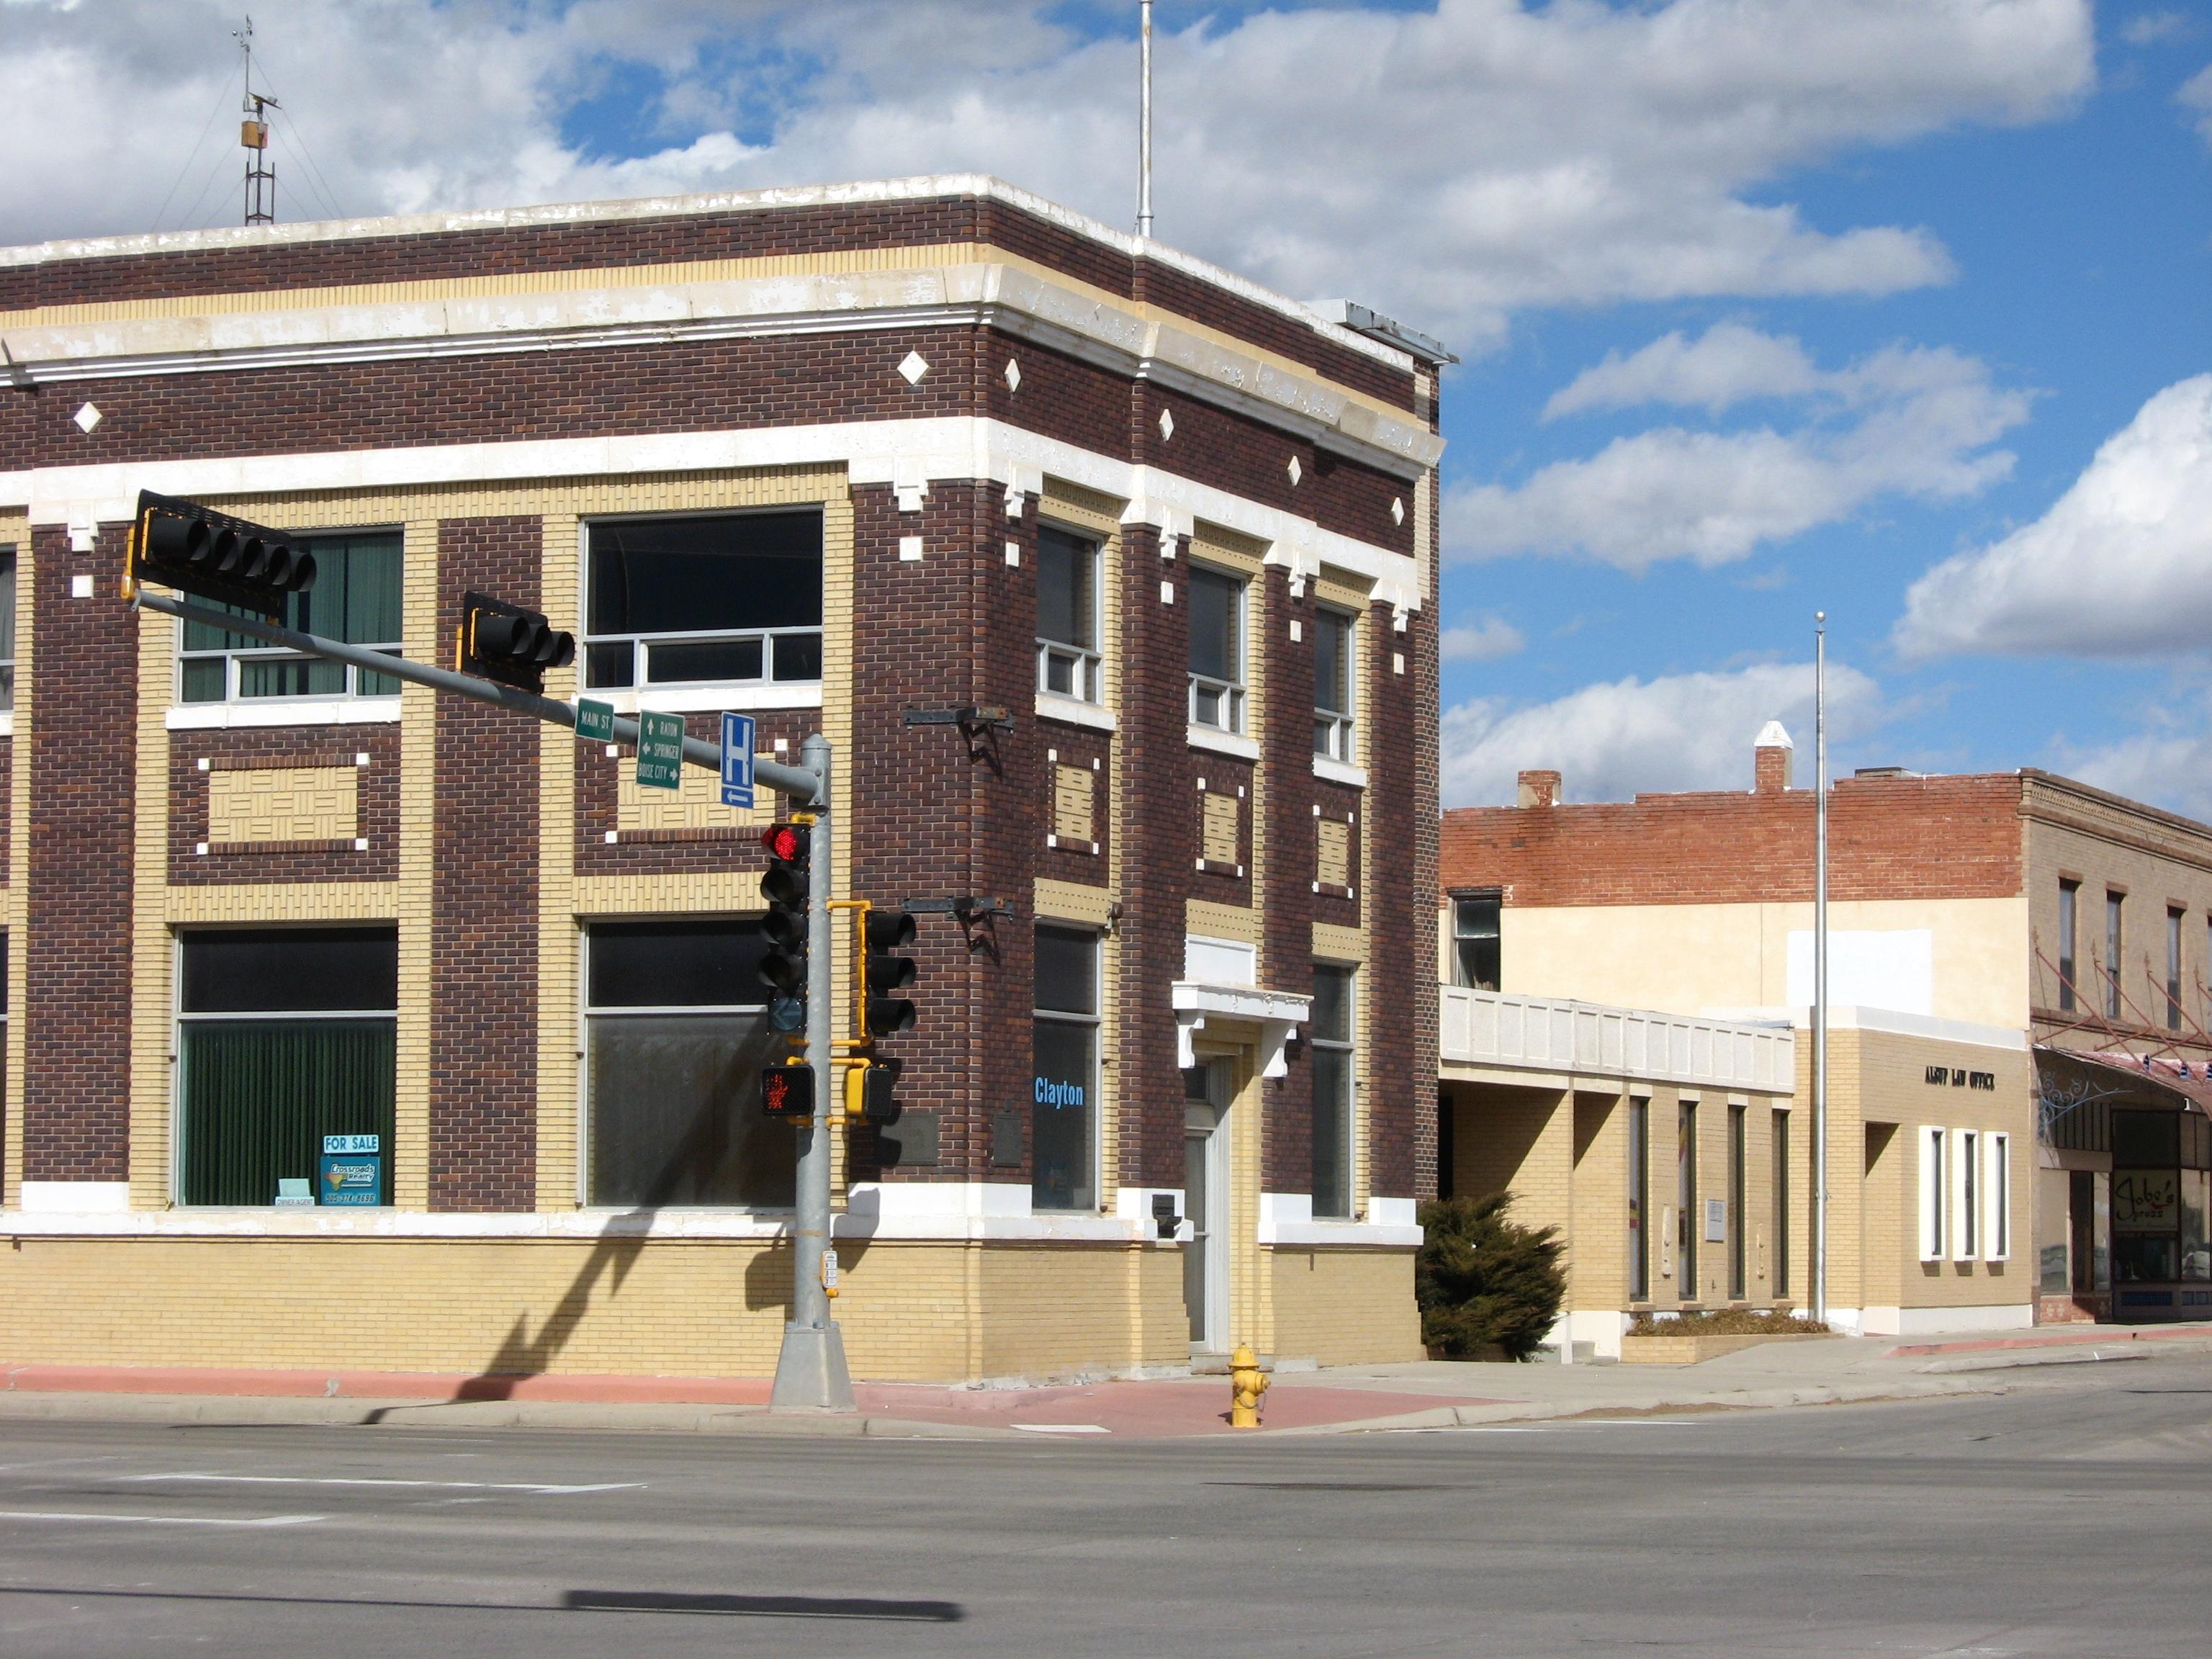 New mexico union county gladstone - New Mexico Union County Gladstone 19